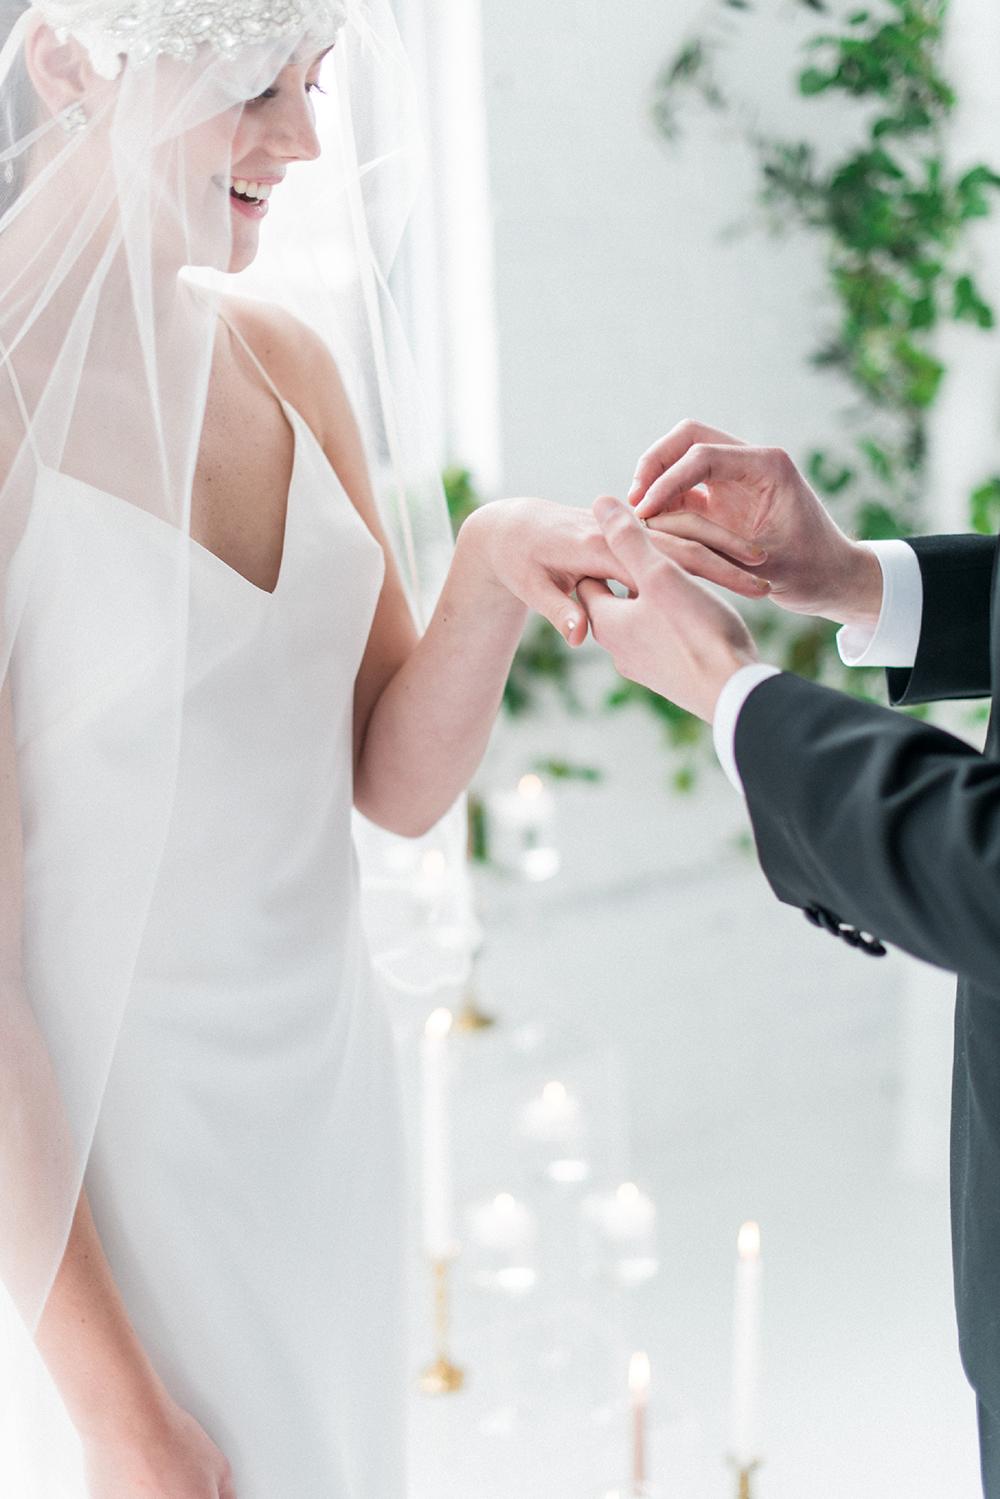 ring exchange - photo by Laura Kelly Photography https://ruffledblog.com/minimalist-monochrome-european-wedding-inspiration